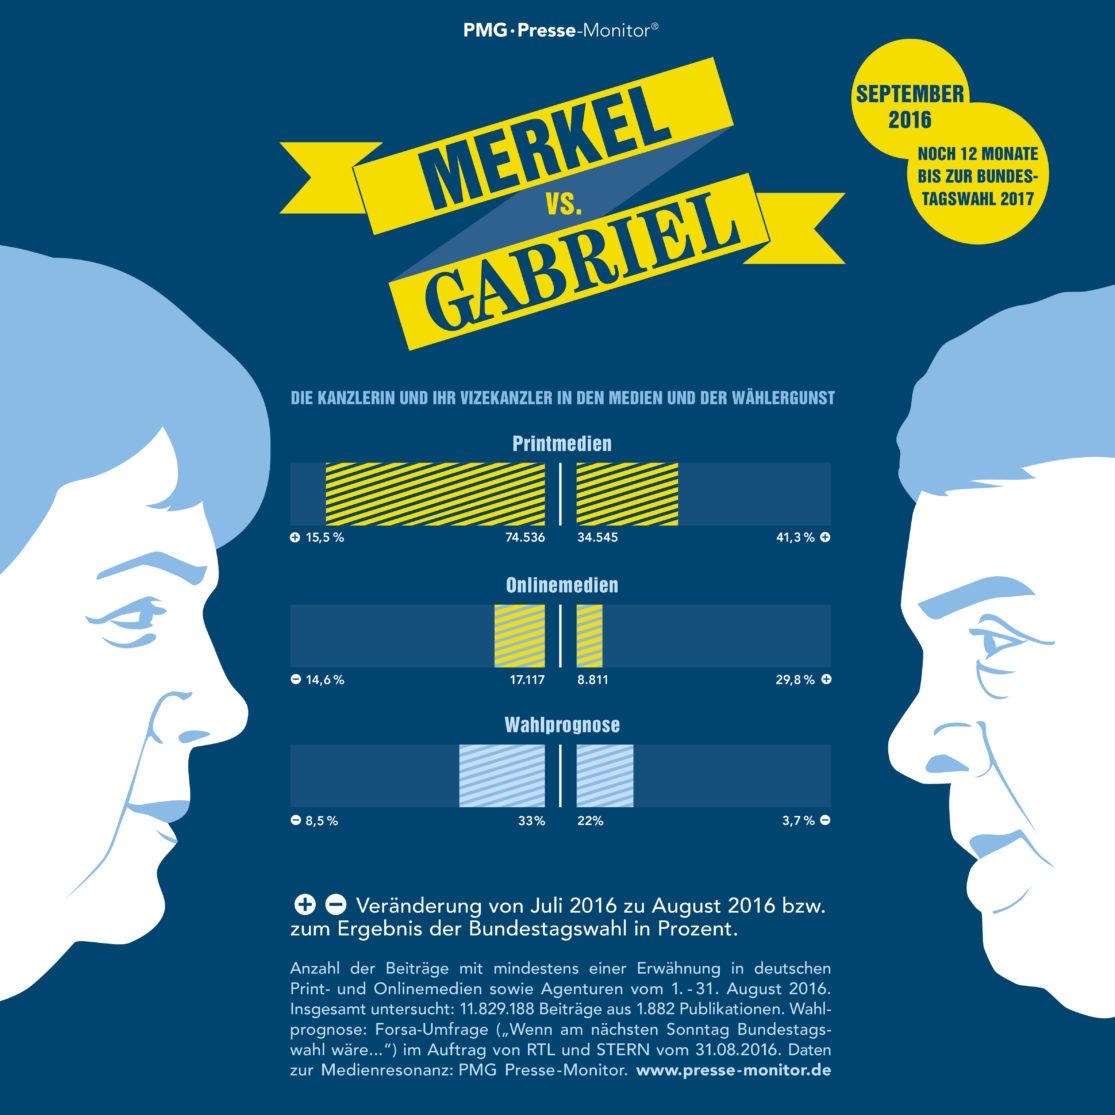 PMG Ranking: Angela Merkel vs. Sigmar Gabriel - September 2016